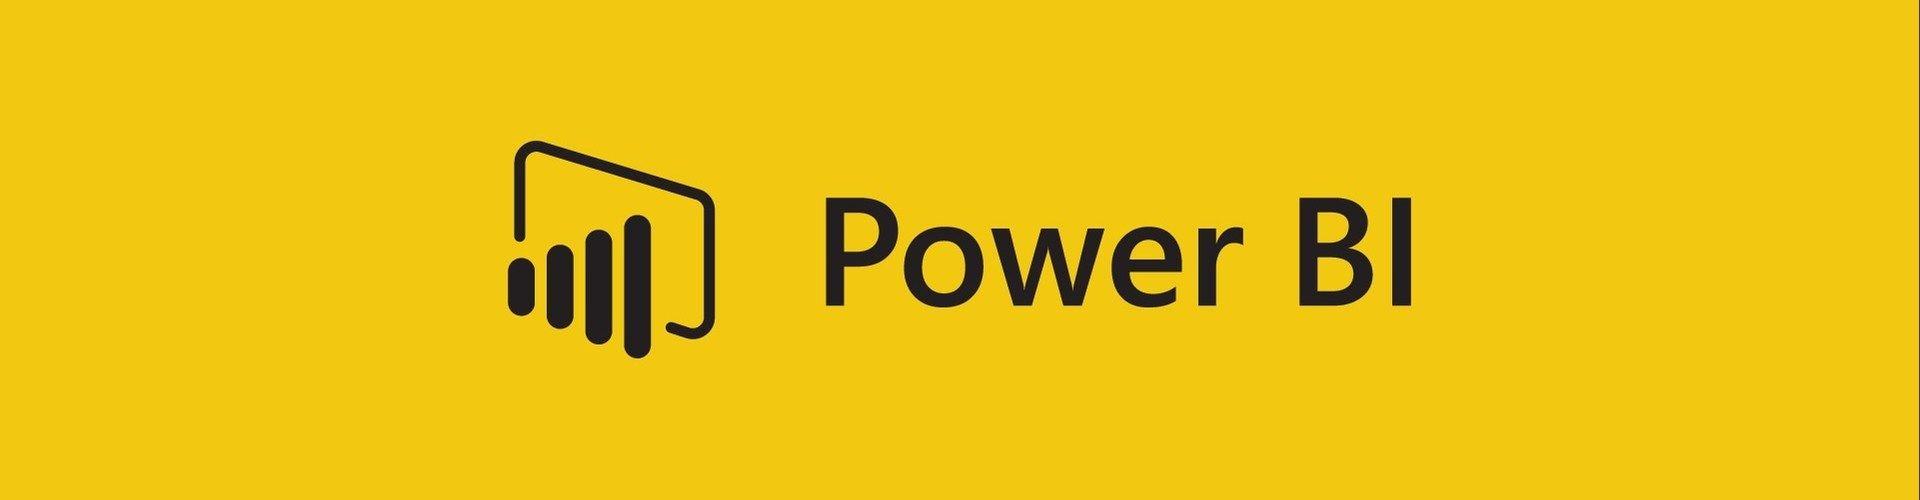 Past Events | Columbus Azure ML and Power BI User Group (Columbus